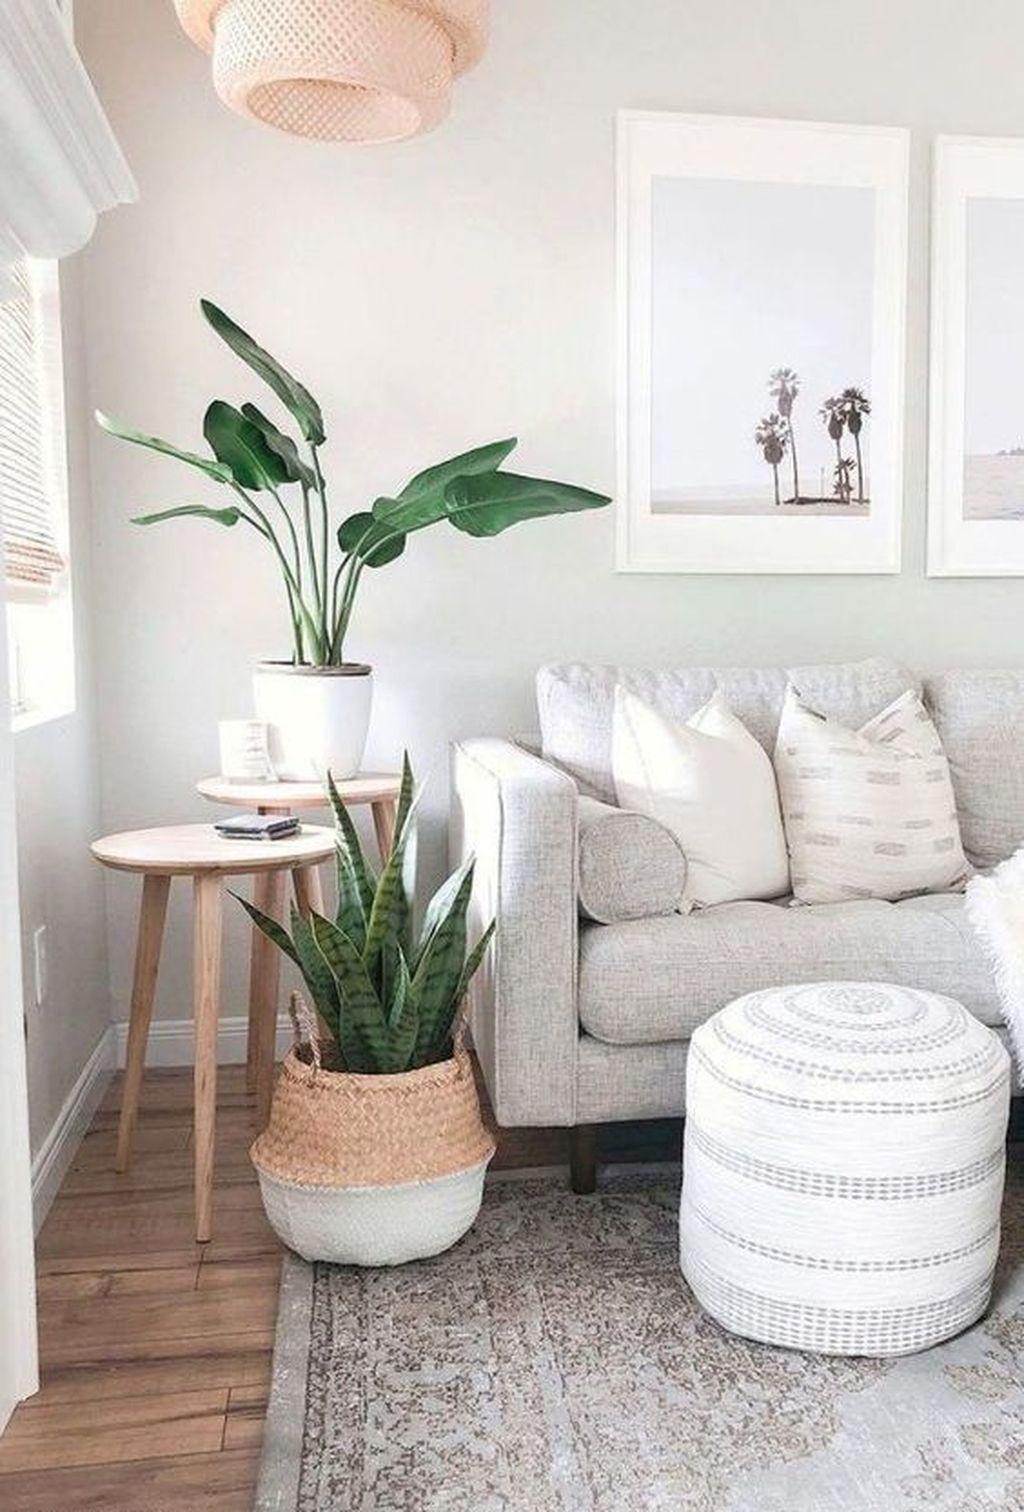 31 Admirable Cozy Living Room Decor Ideas In 2020 Modern Apartment Decor Storage Furniture Living Room Interior Design Living Room